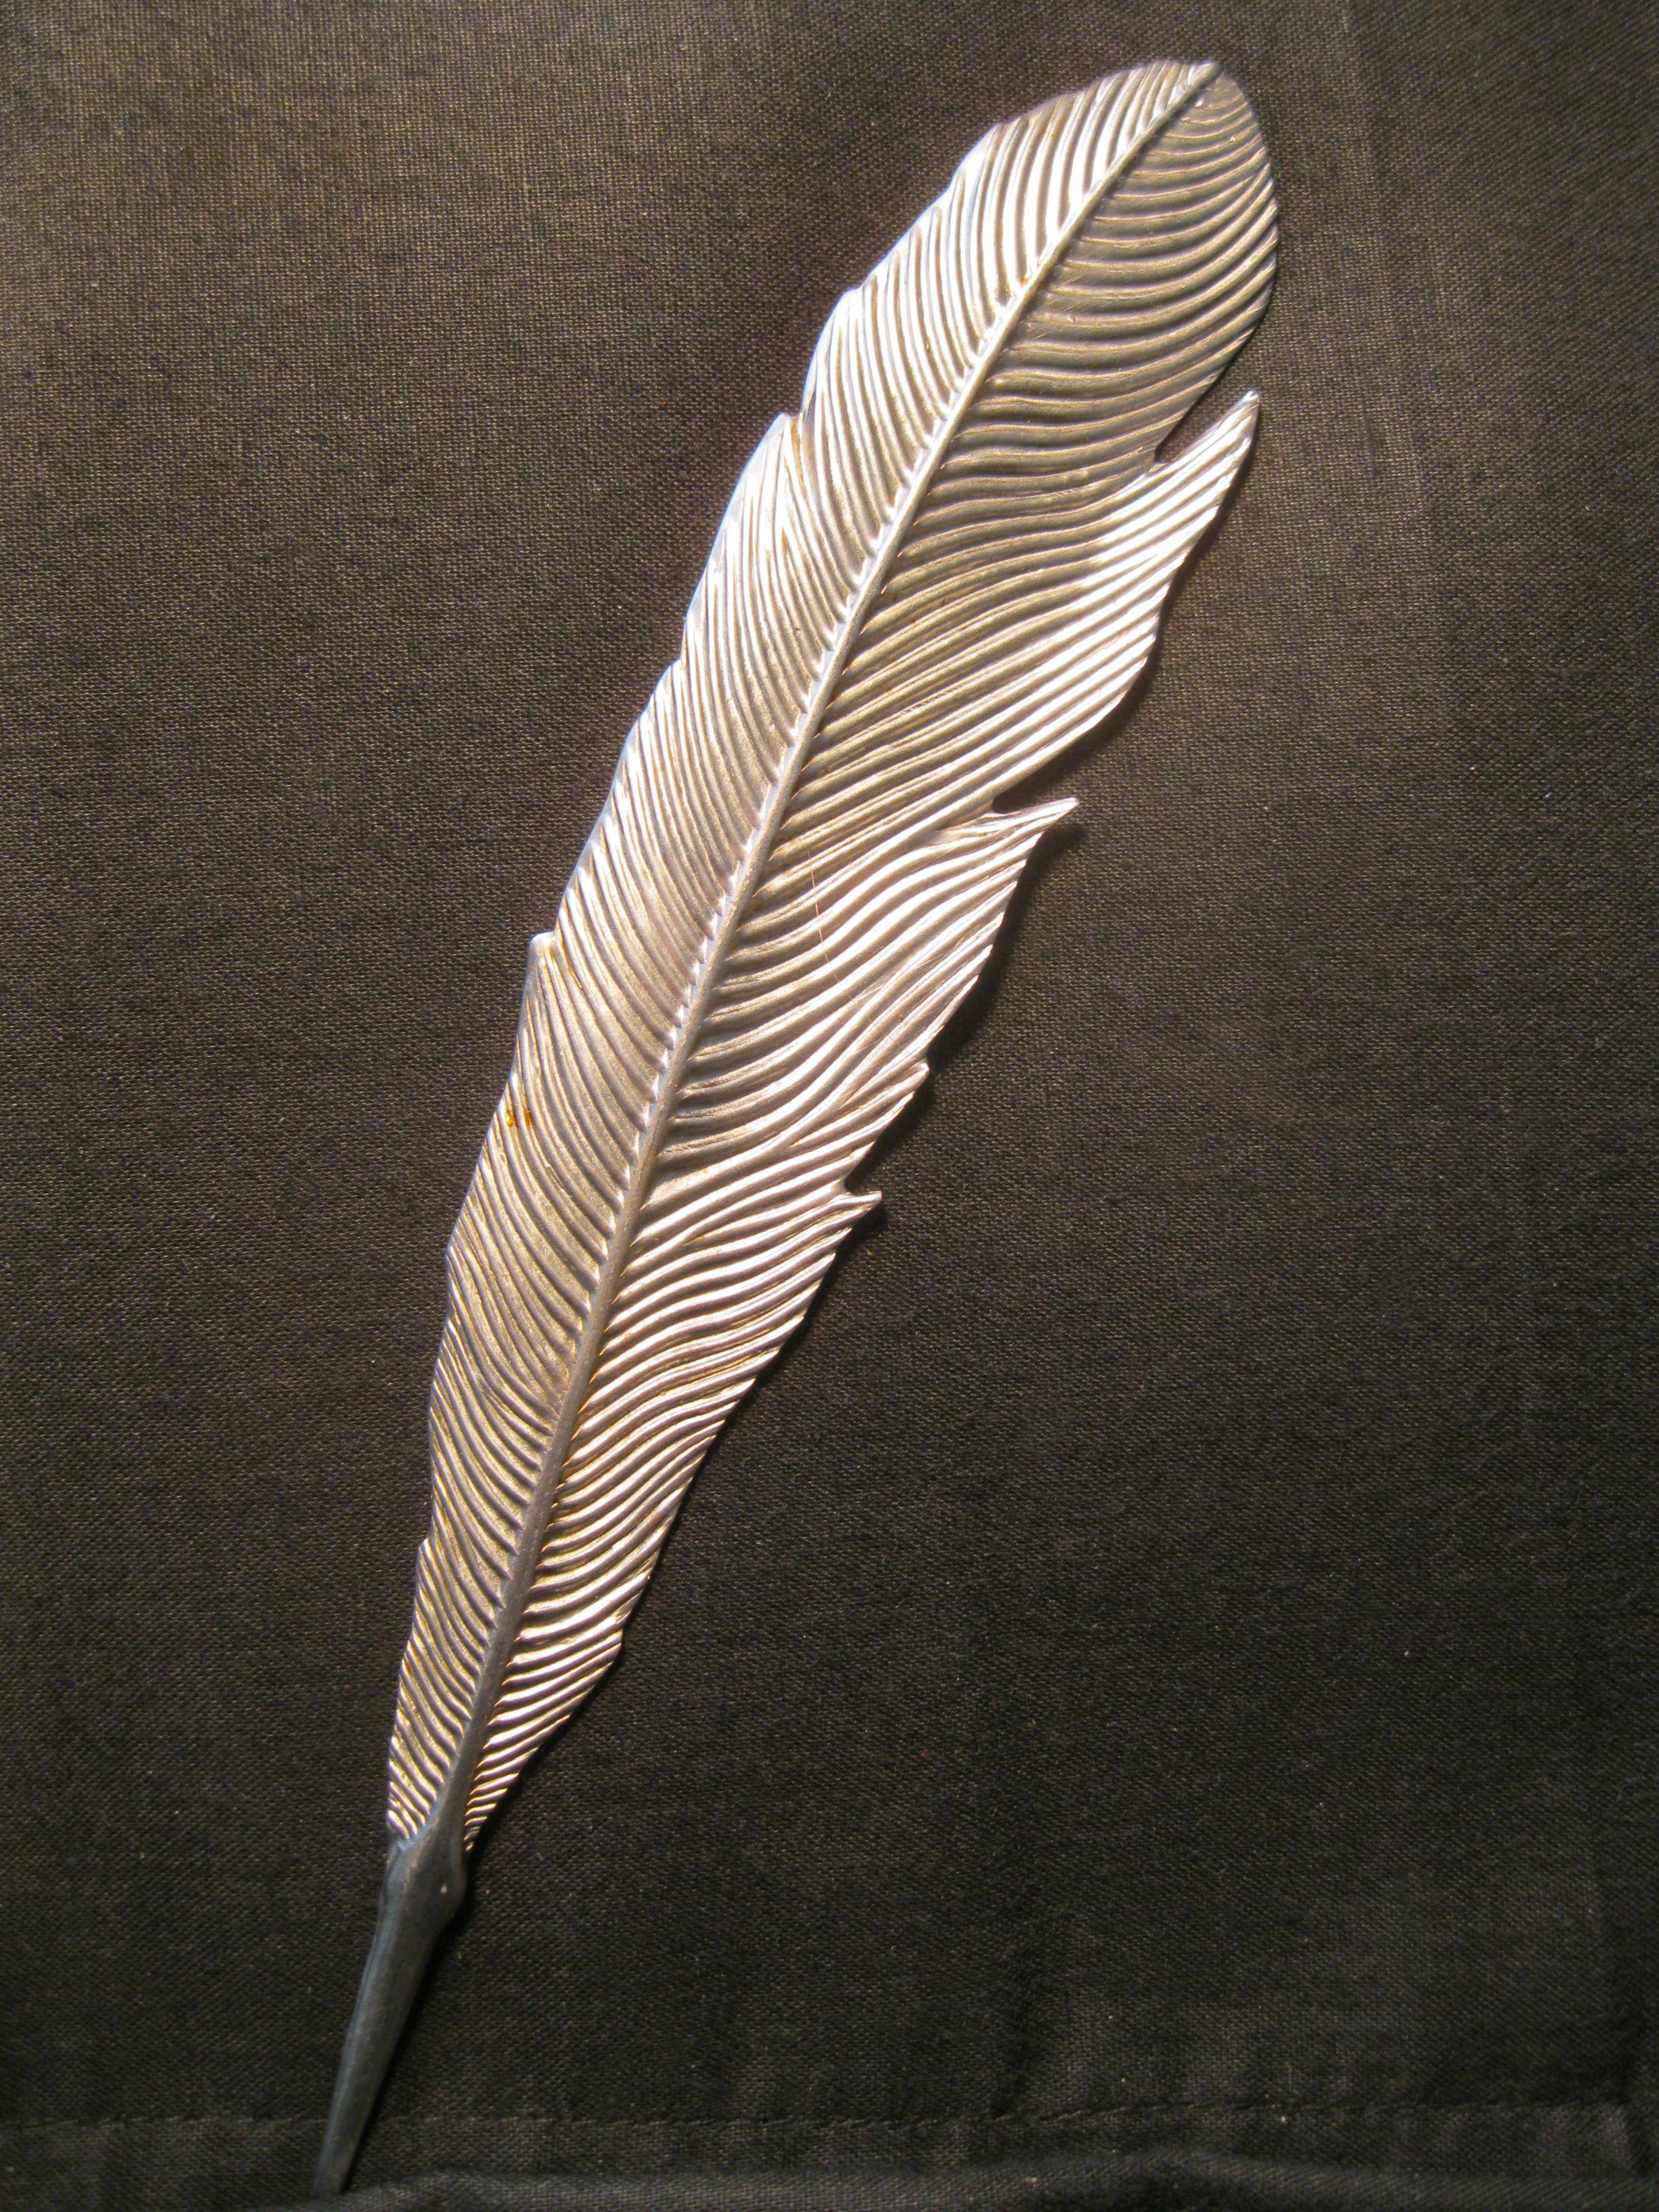 Design we love chandelier feathers Art Condos Blog